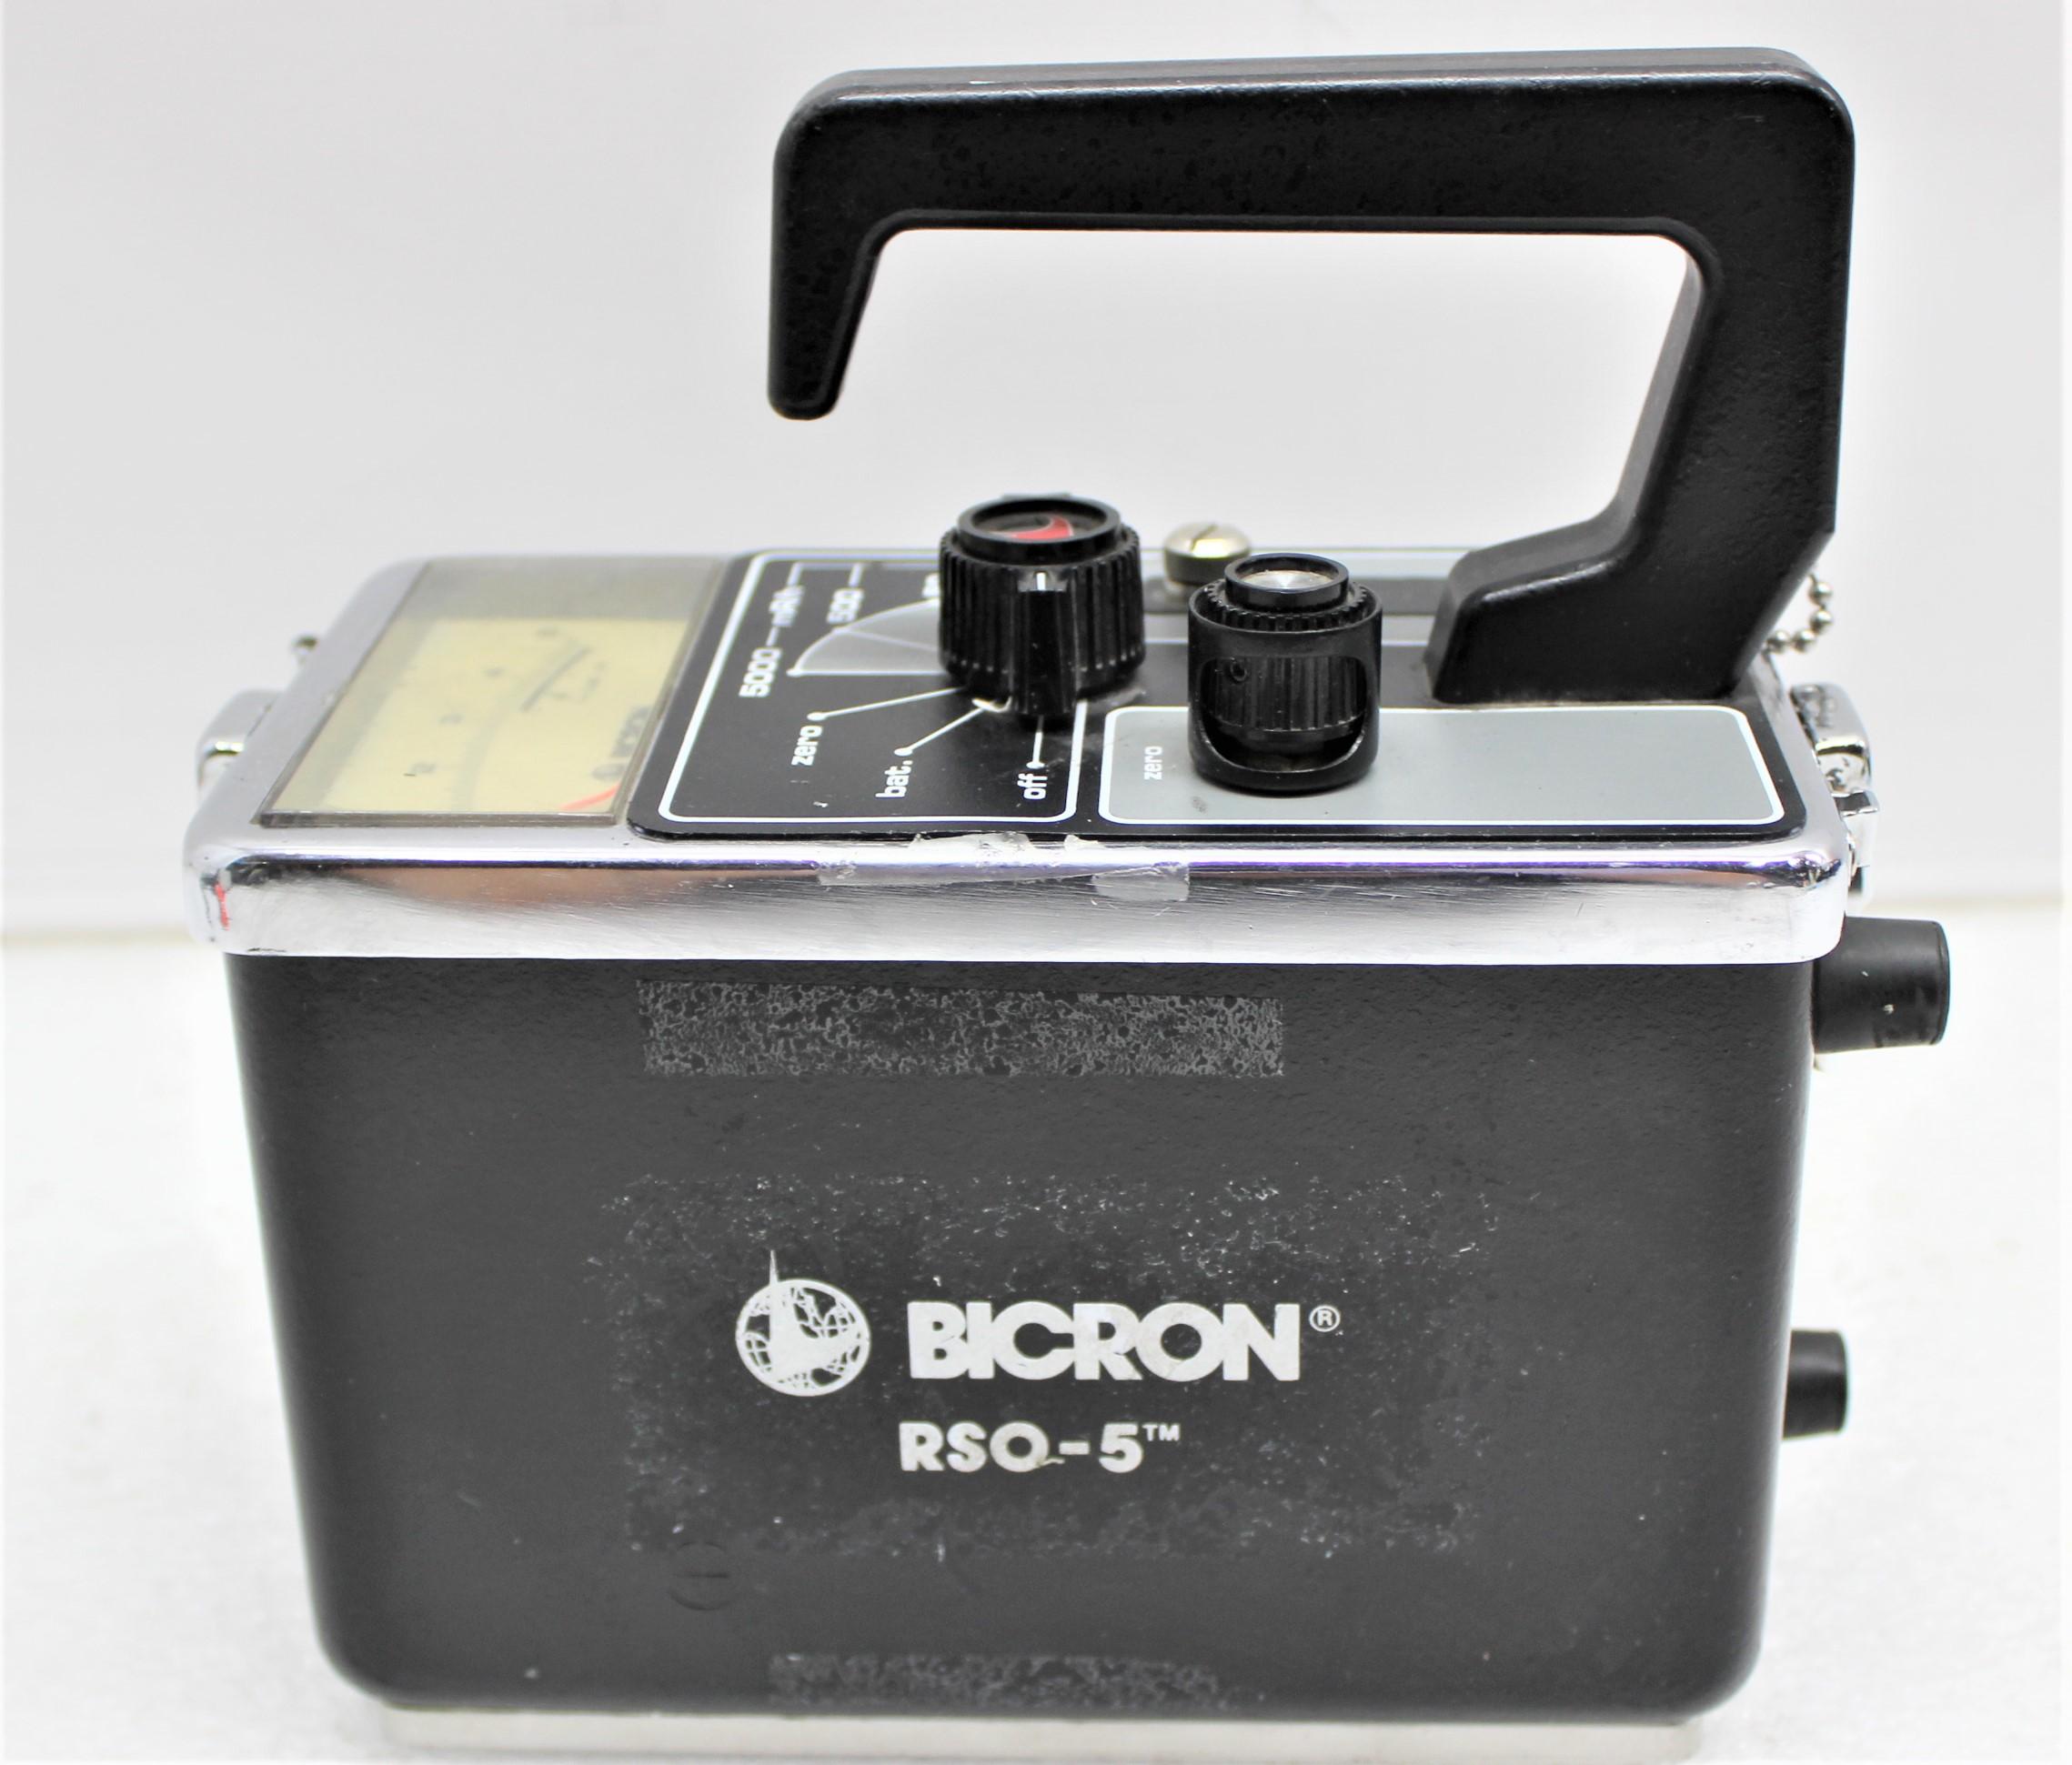 Image BICRON RSO-5 Portable Survey Meter 1587249